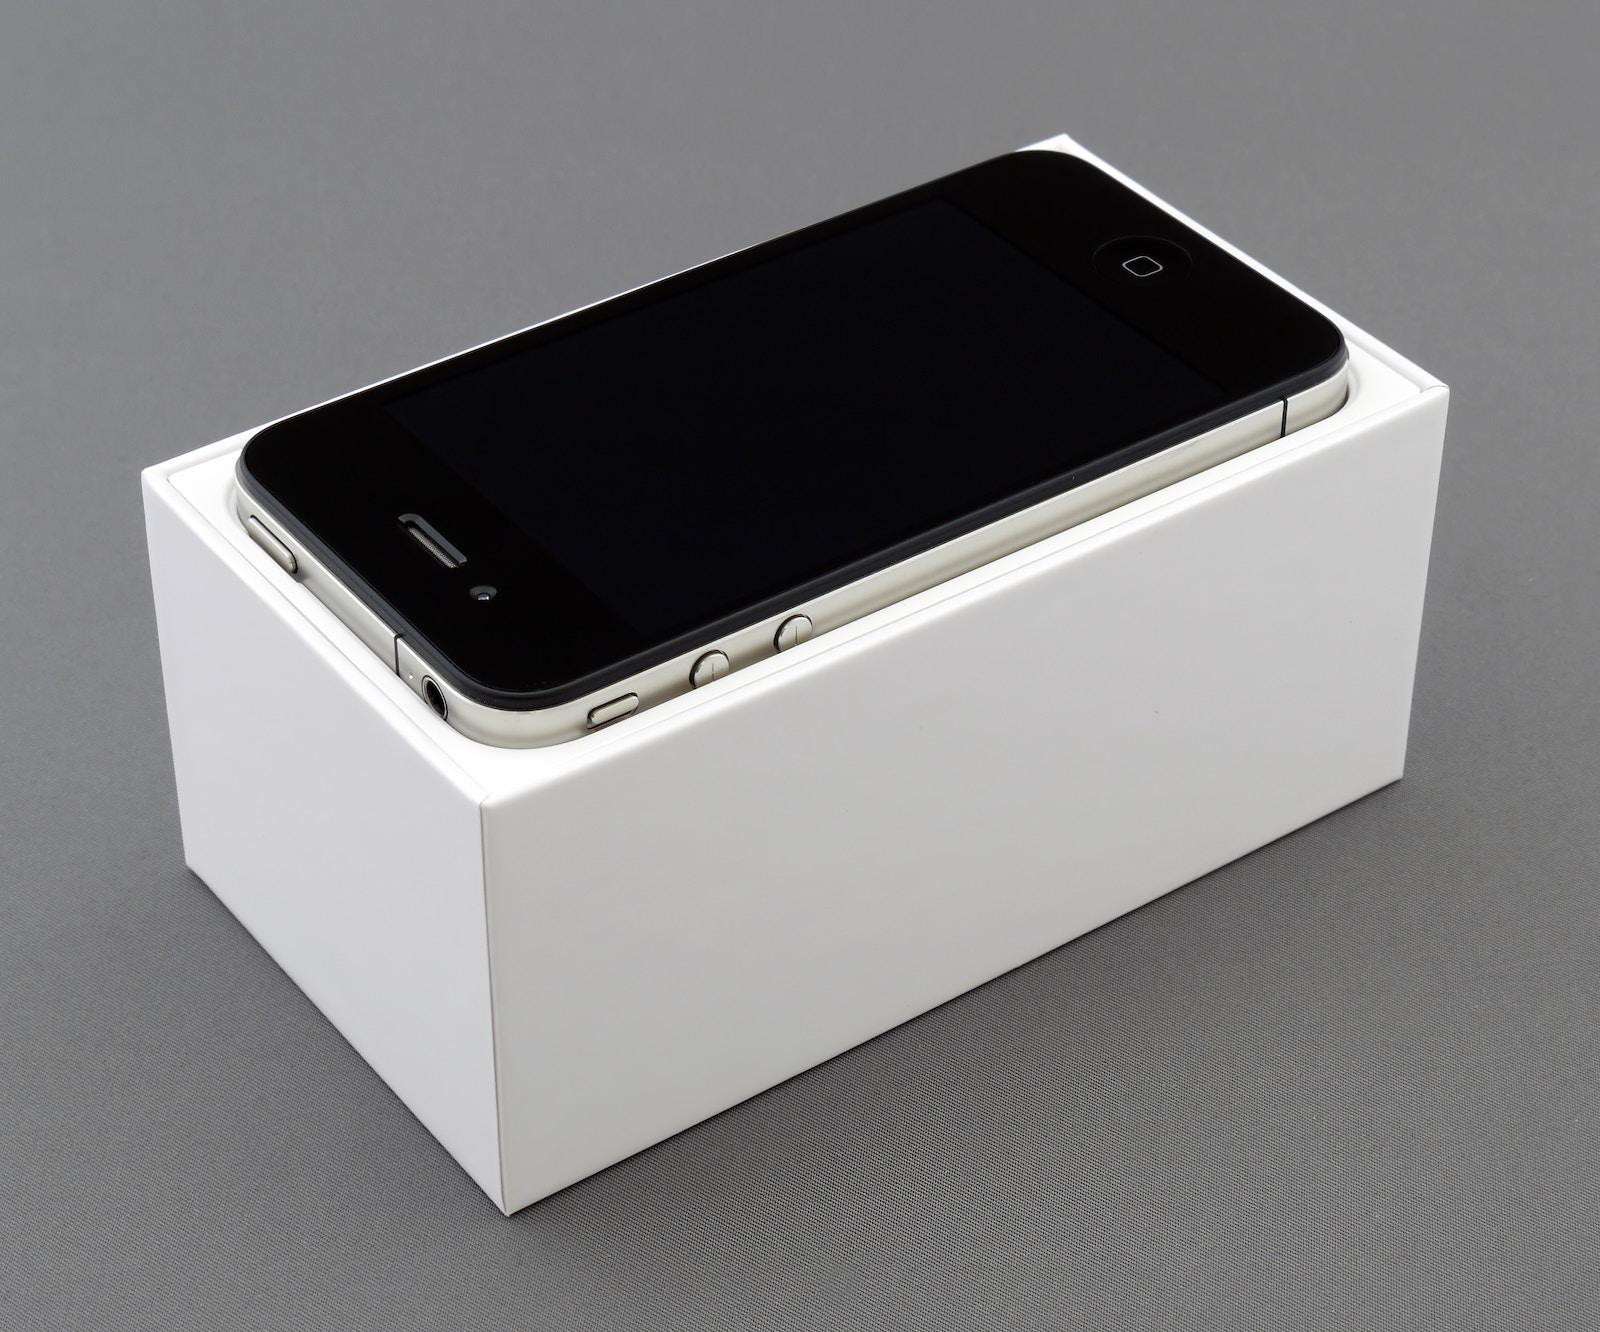 brett-jordan-SQBHjCH71x4-unsplash-iphone4.jpg